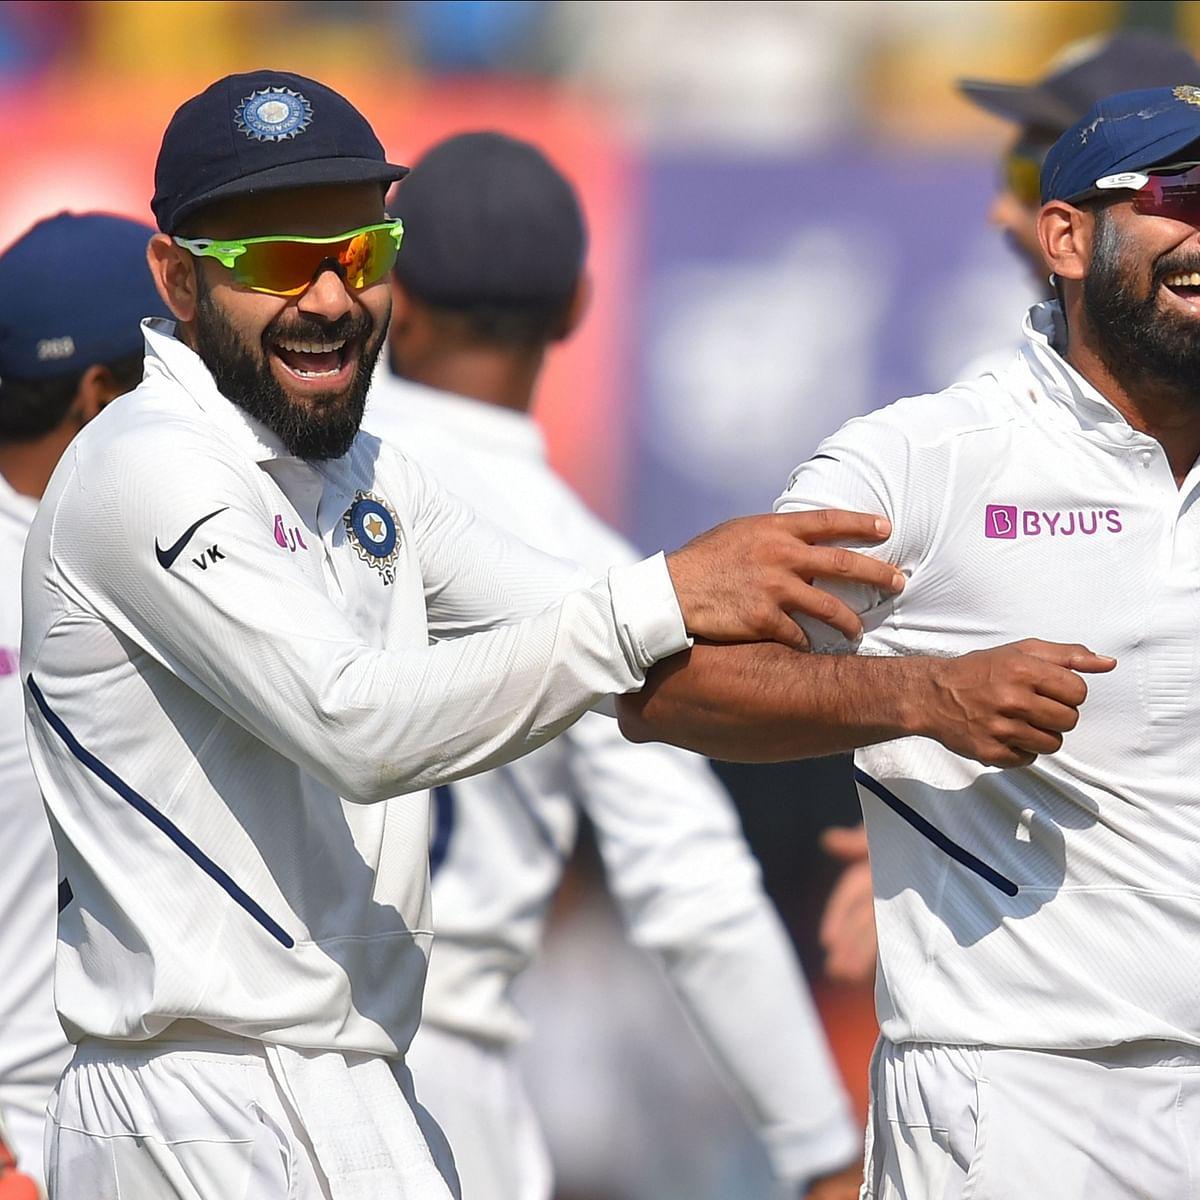 India vs Bangladesh 1st Test: Virat Kohli bowled over by pace trio's brilliance